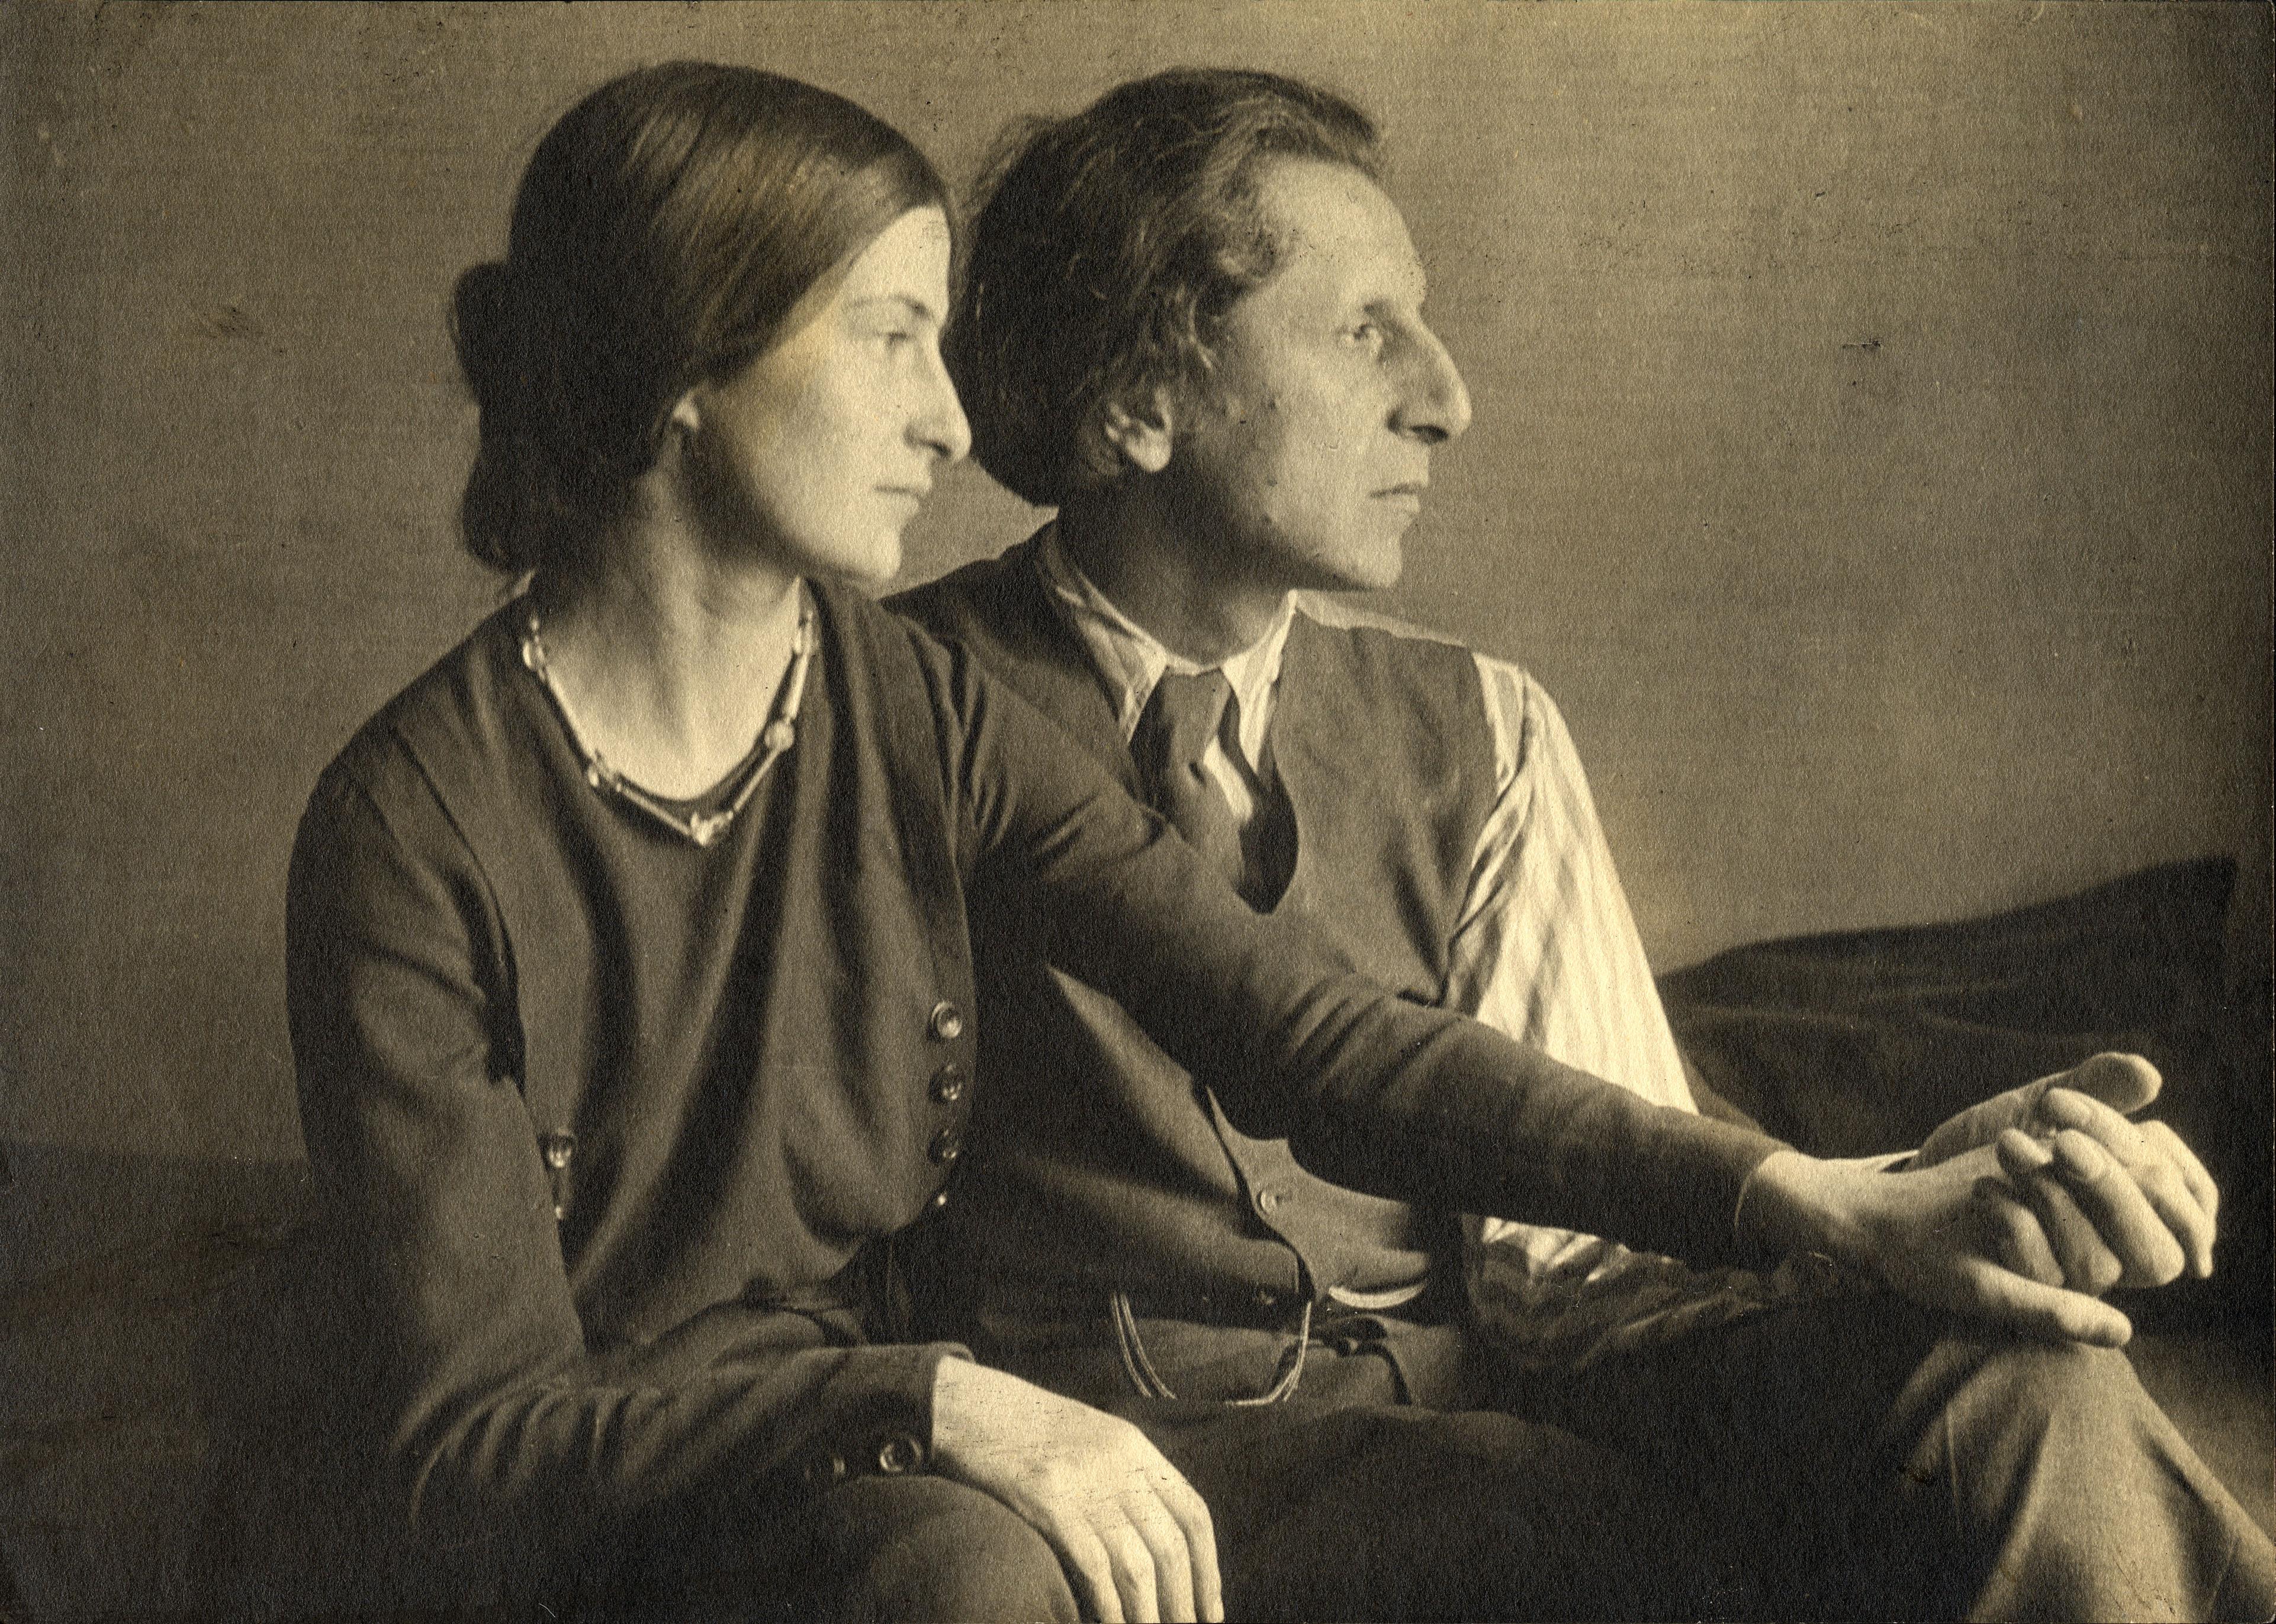 Ananda Coomaraswamy with Stella Bloch, c. 1922